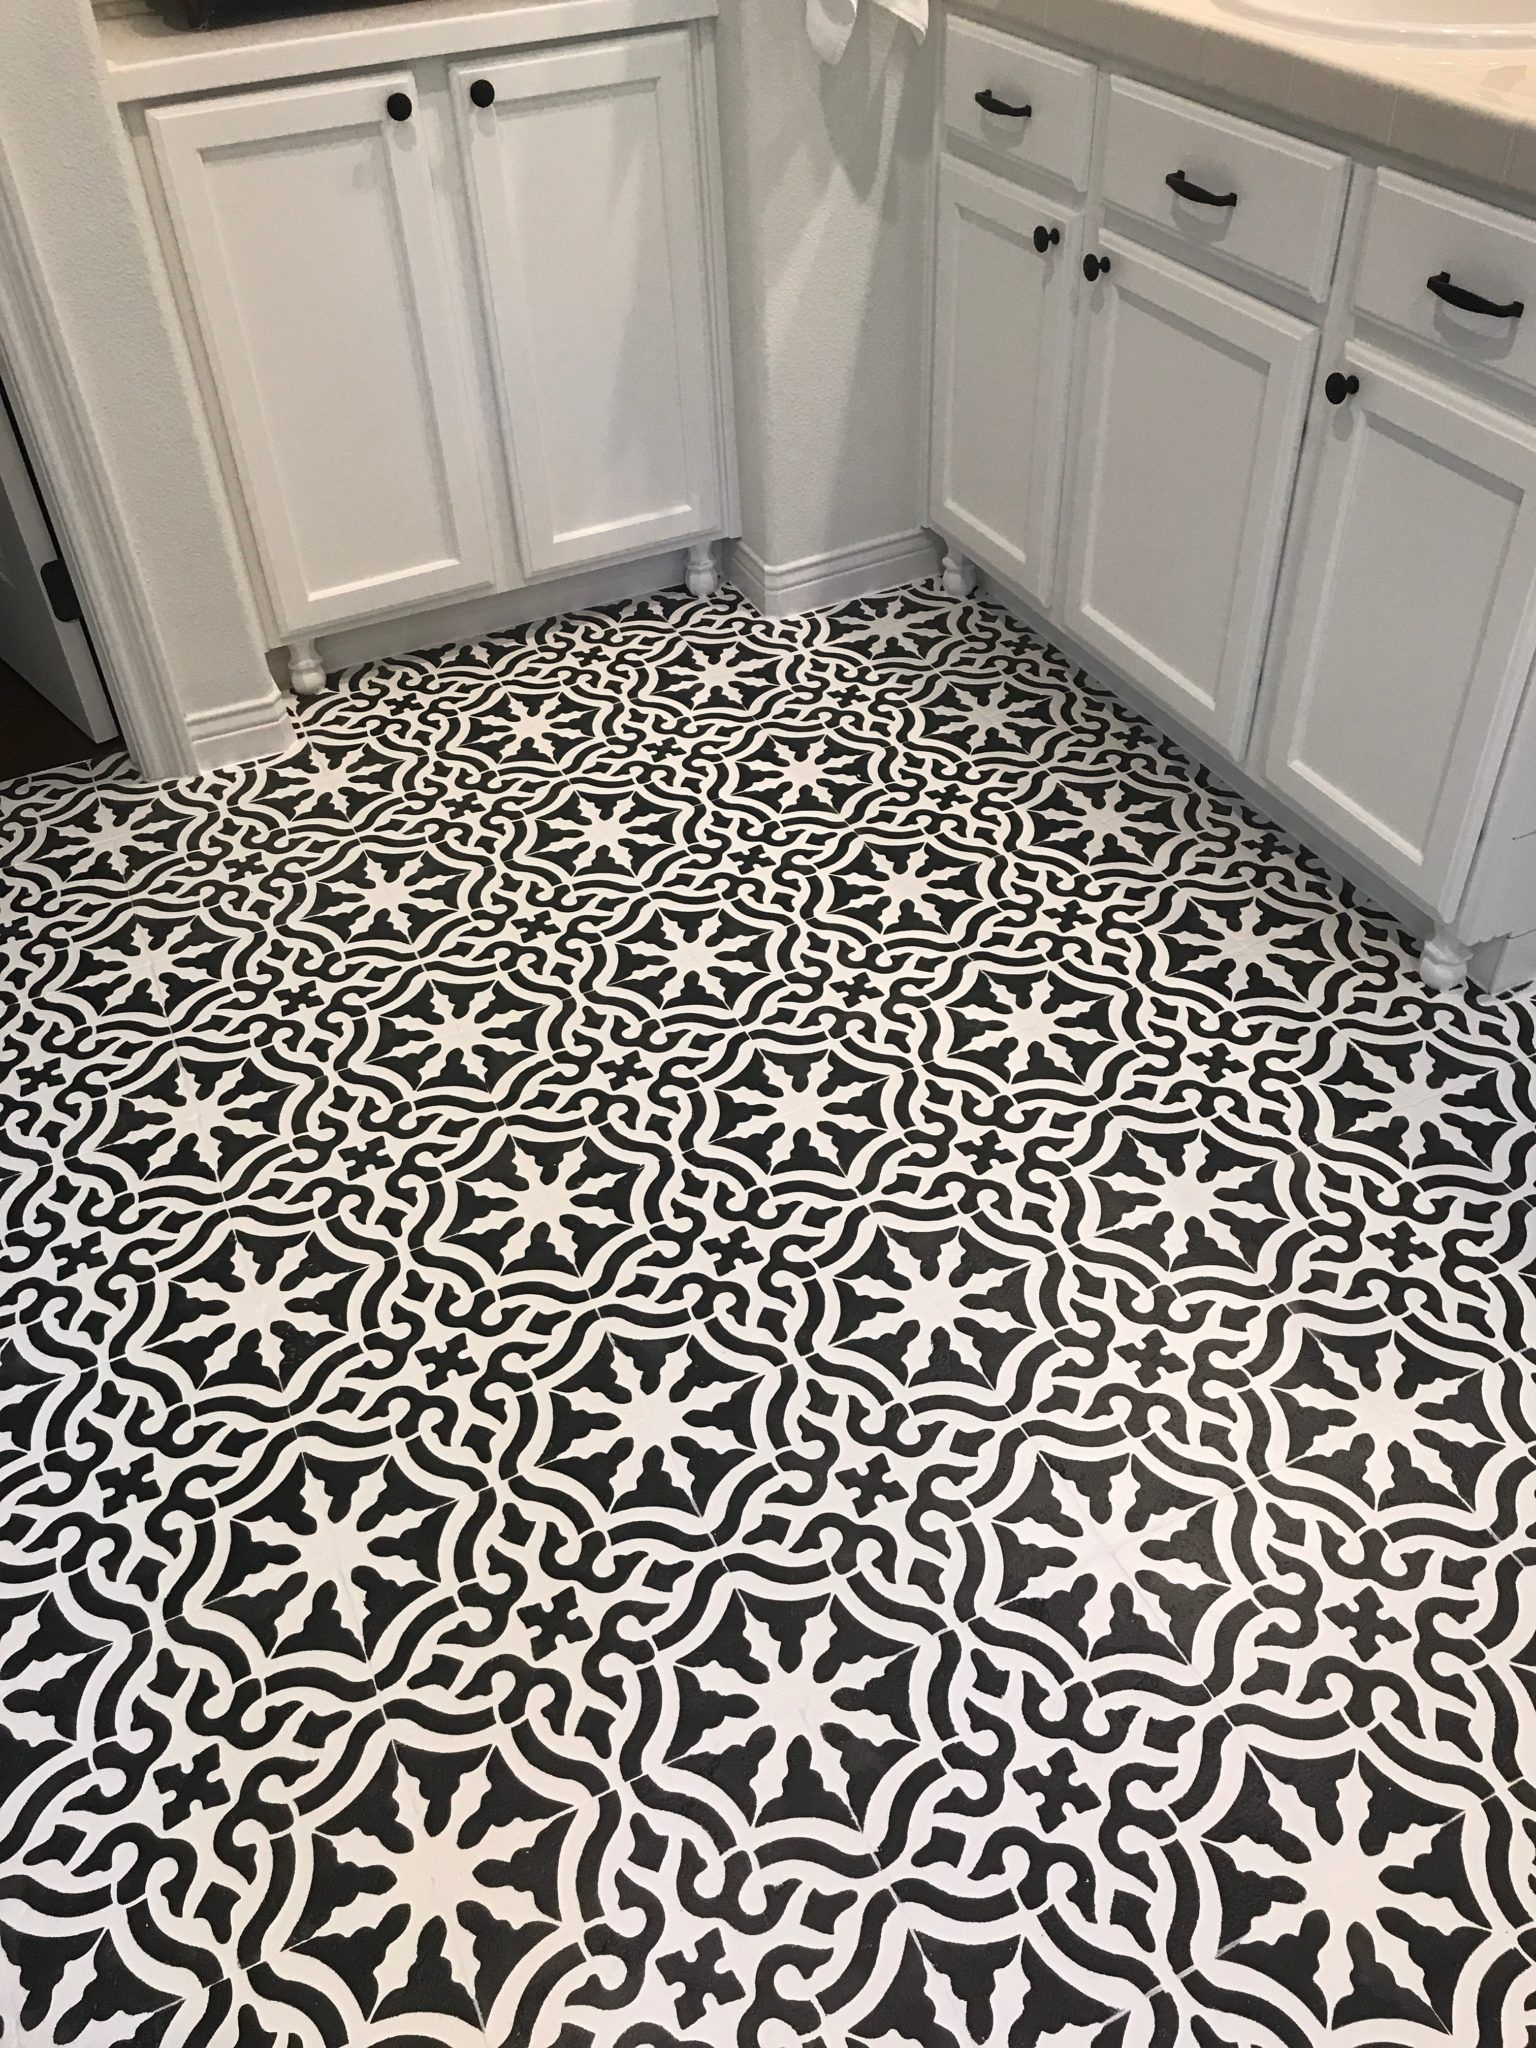 Toledo Tile Stencil Tiles Stenciled Floor Tile Floor